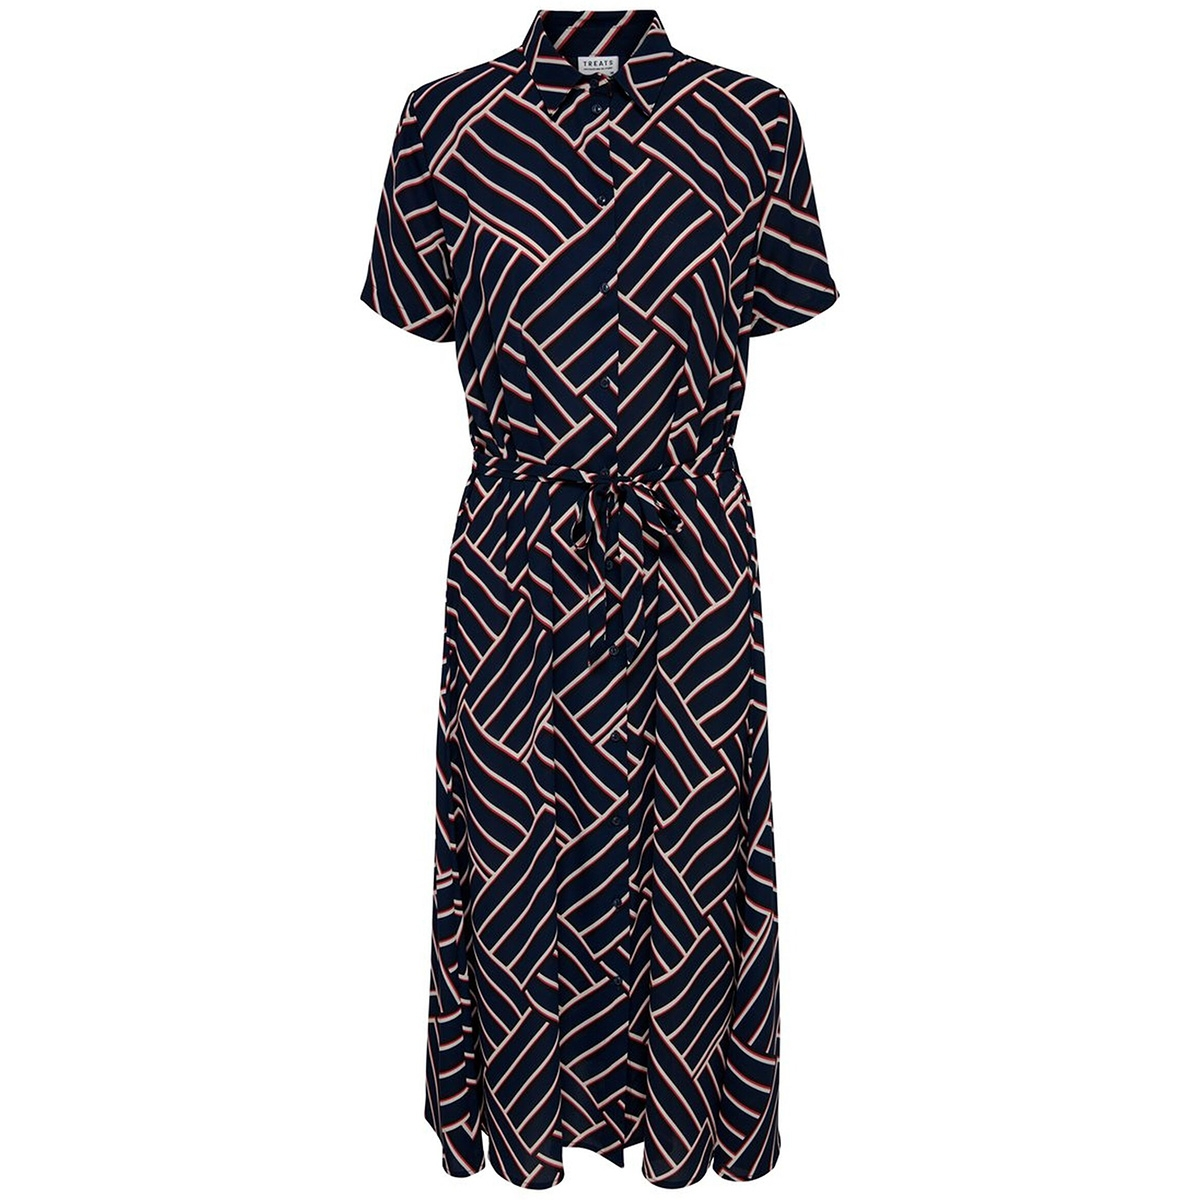 jdywin treats s/s long dress wvn 15179844 jacqueline de yong jurk sky captain/graphical